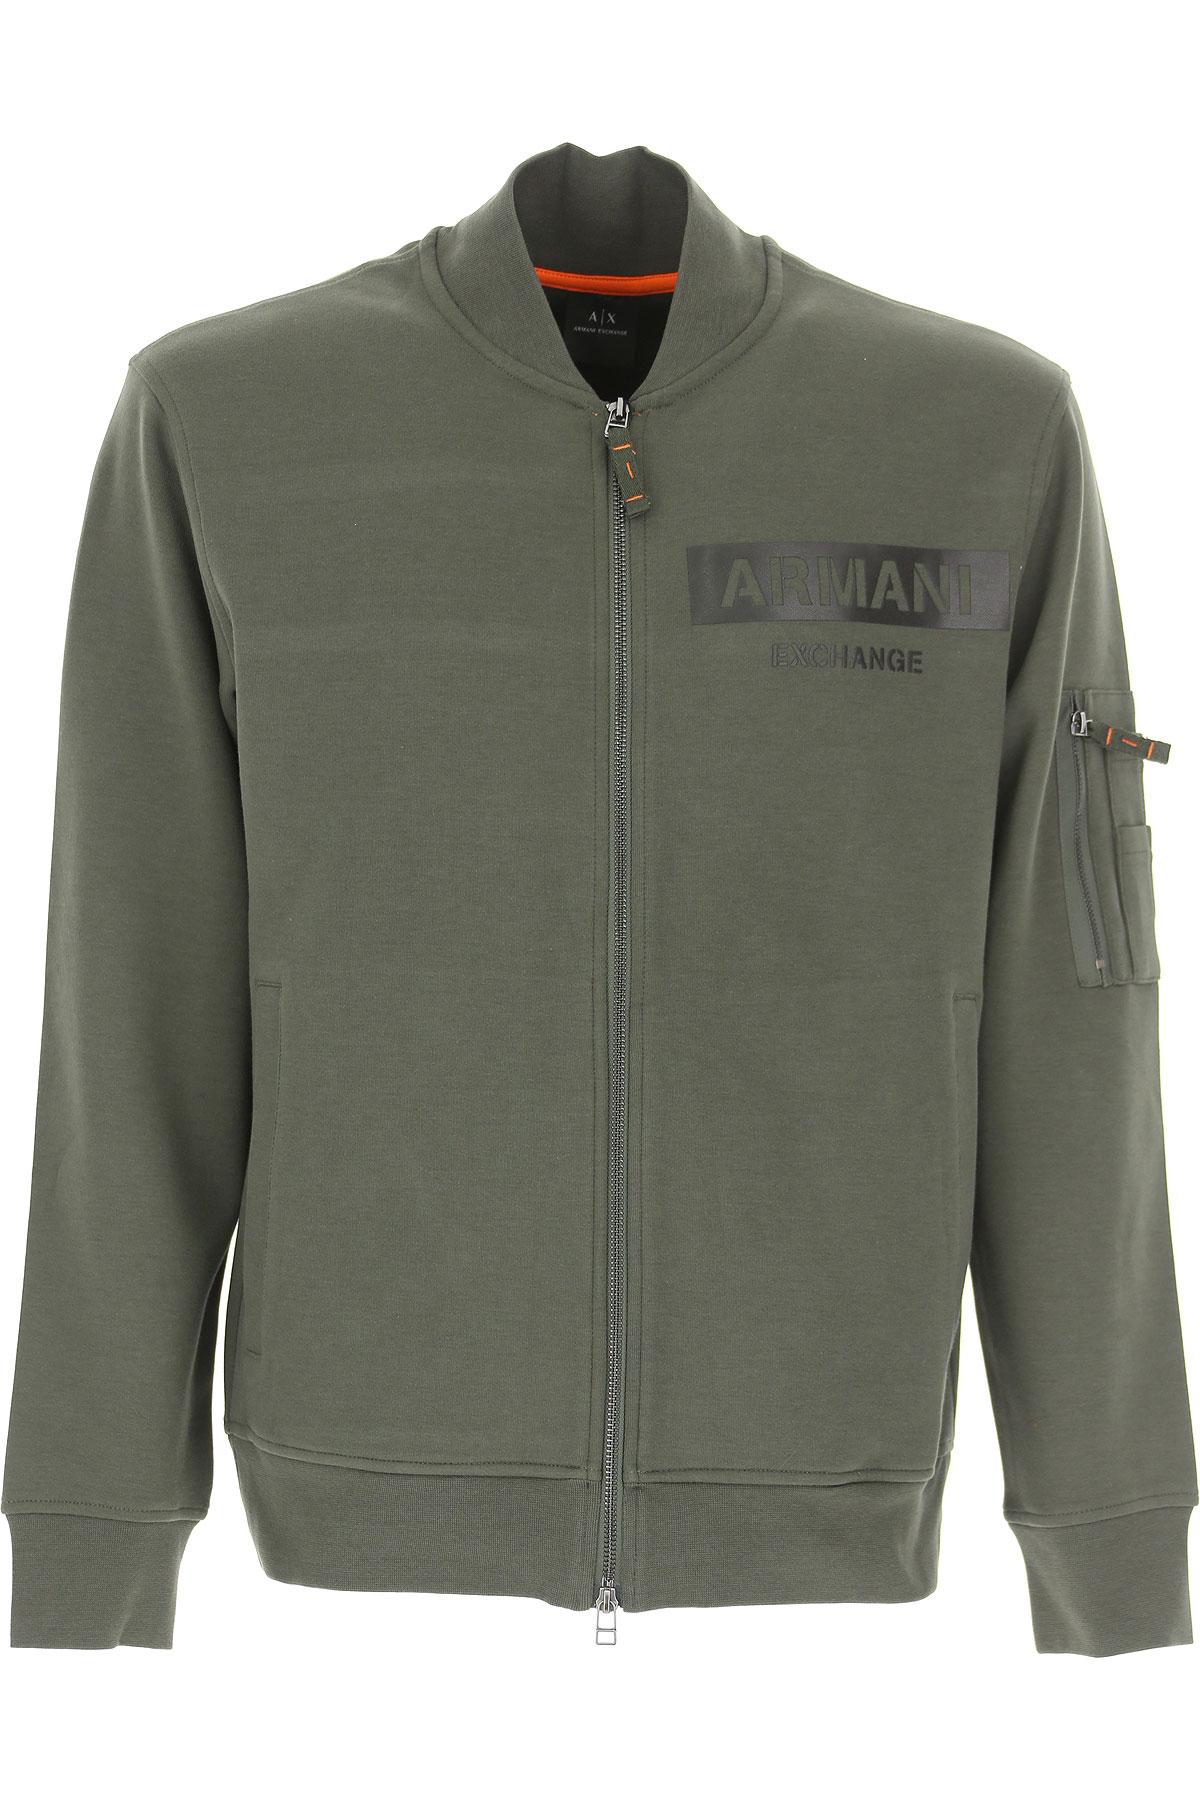 Emporio Armani Sweatshirt for Men, Forest Green, Cotton, 2017, L M S XL USA-472342